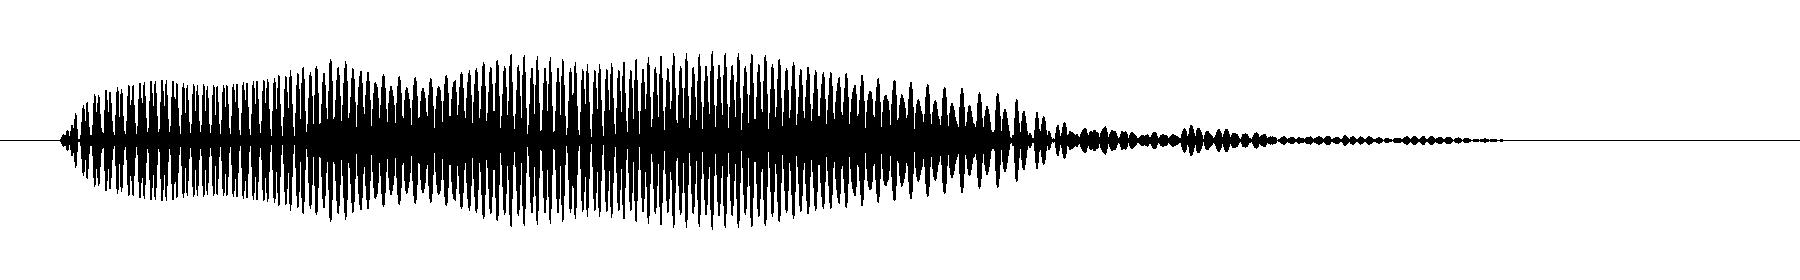 alvinspk65